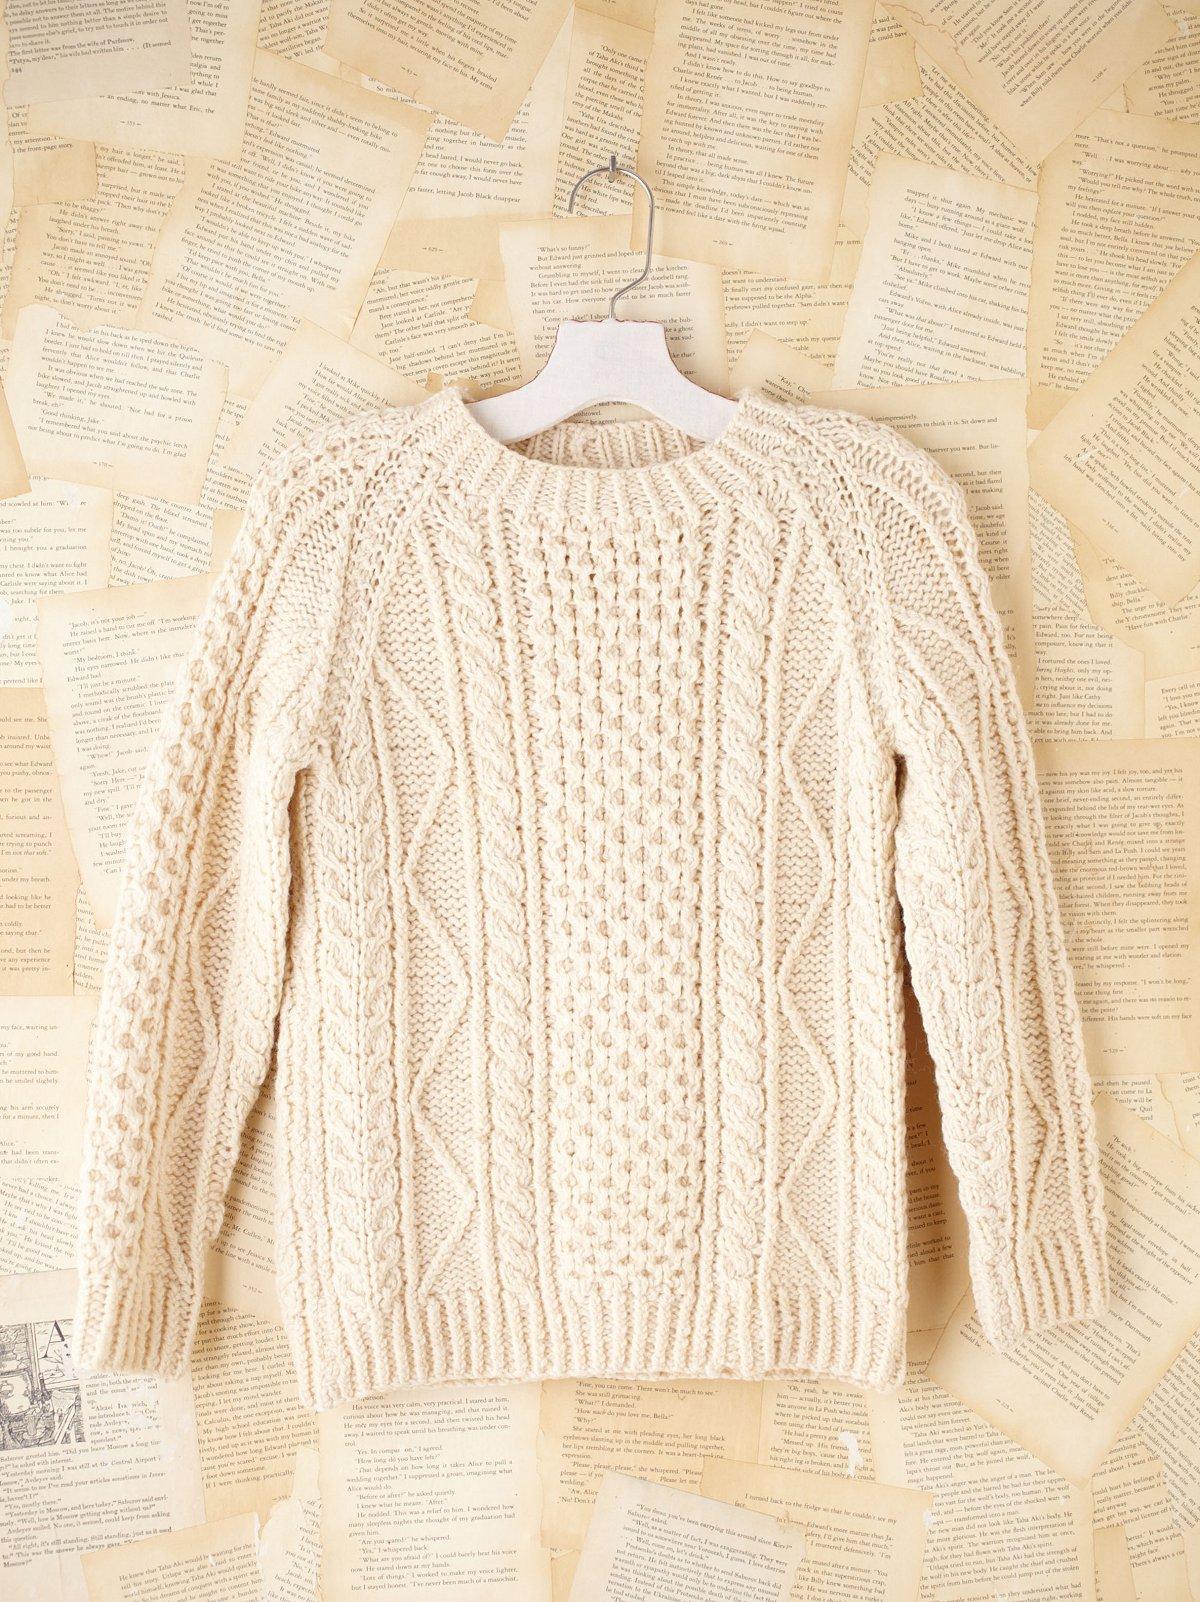 Vintage Hand Knit Aran Sweater